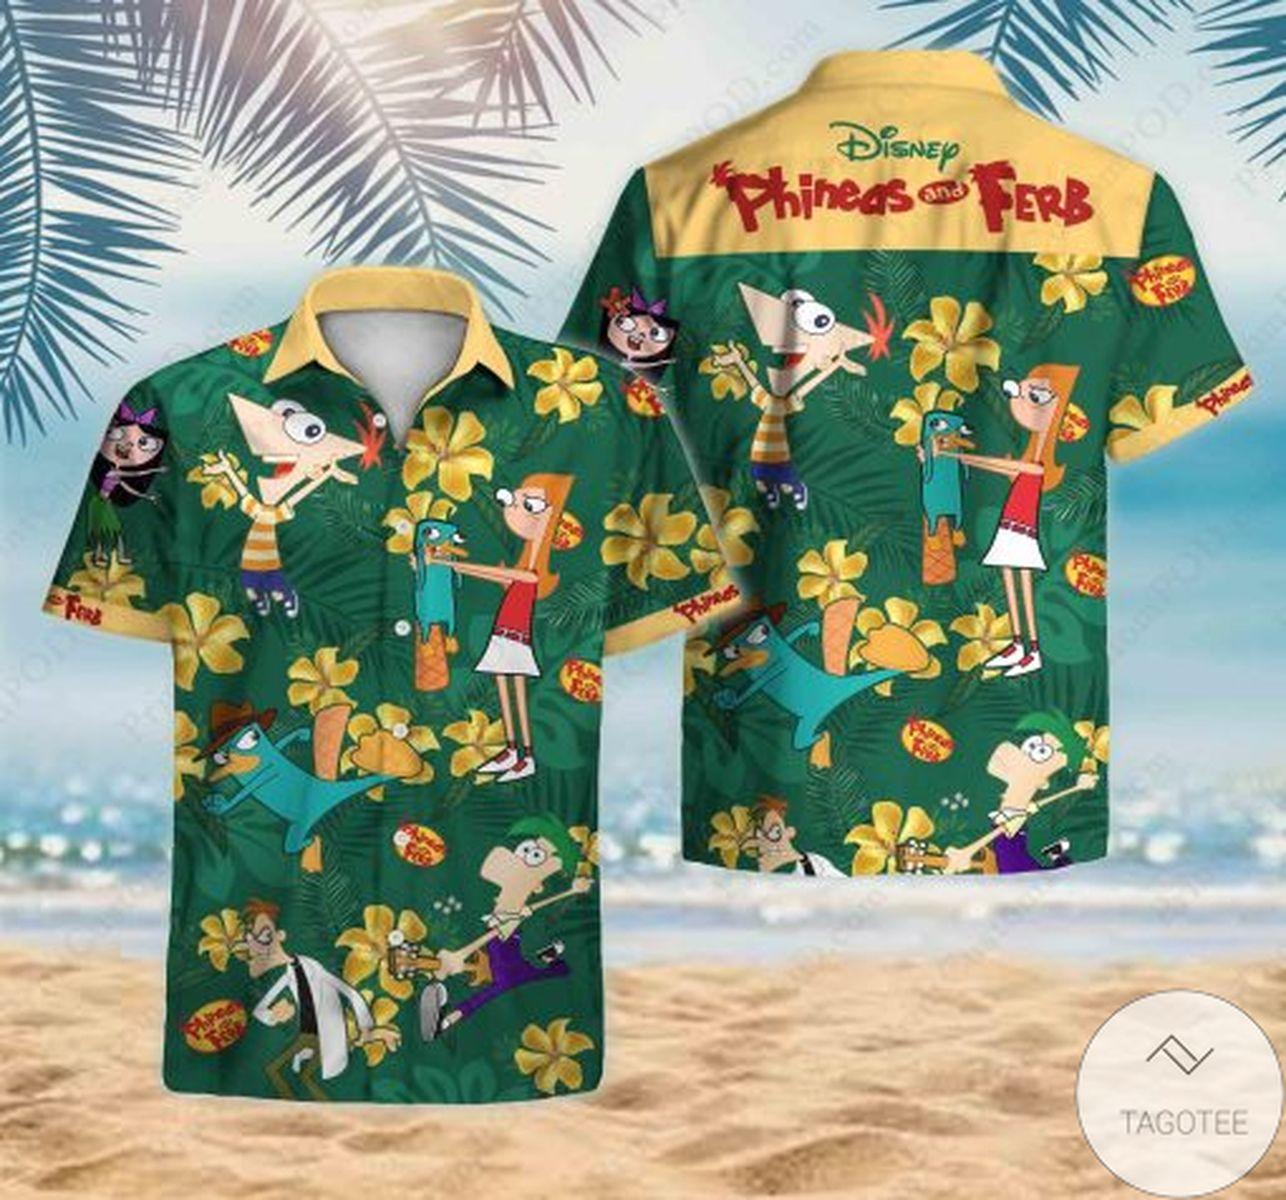 Phineas And Ferb Theme Hawaiian Shirt